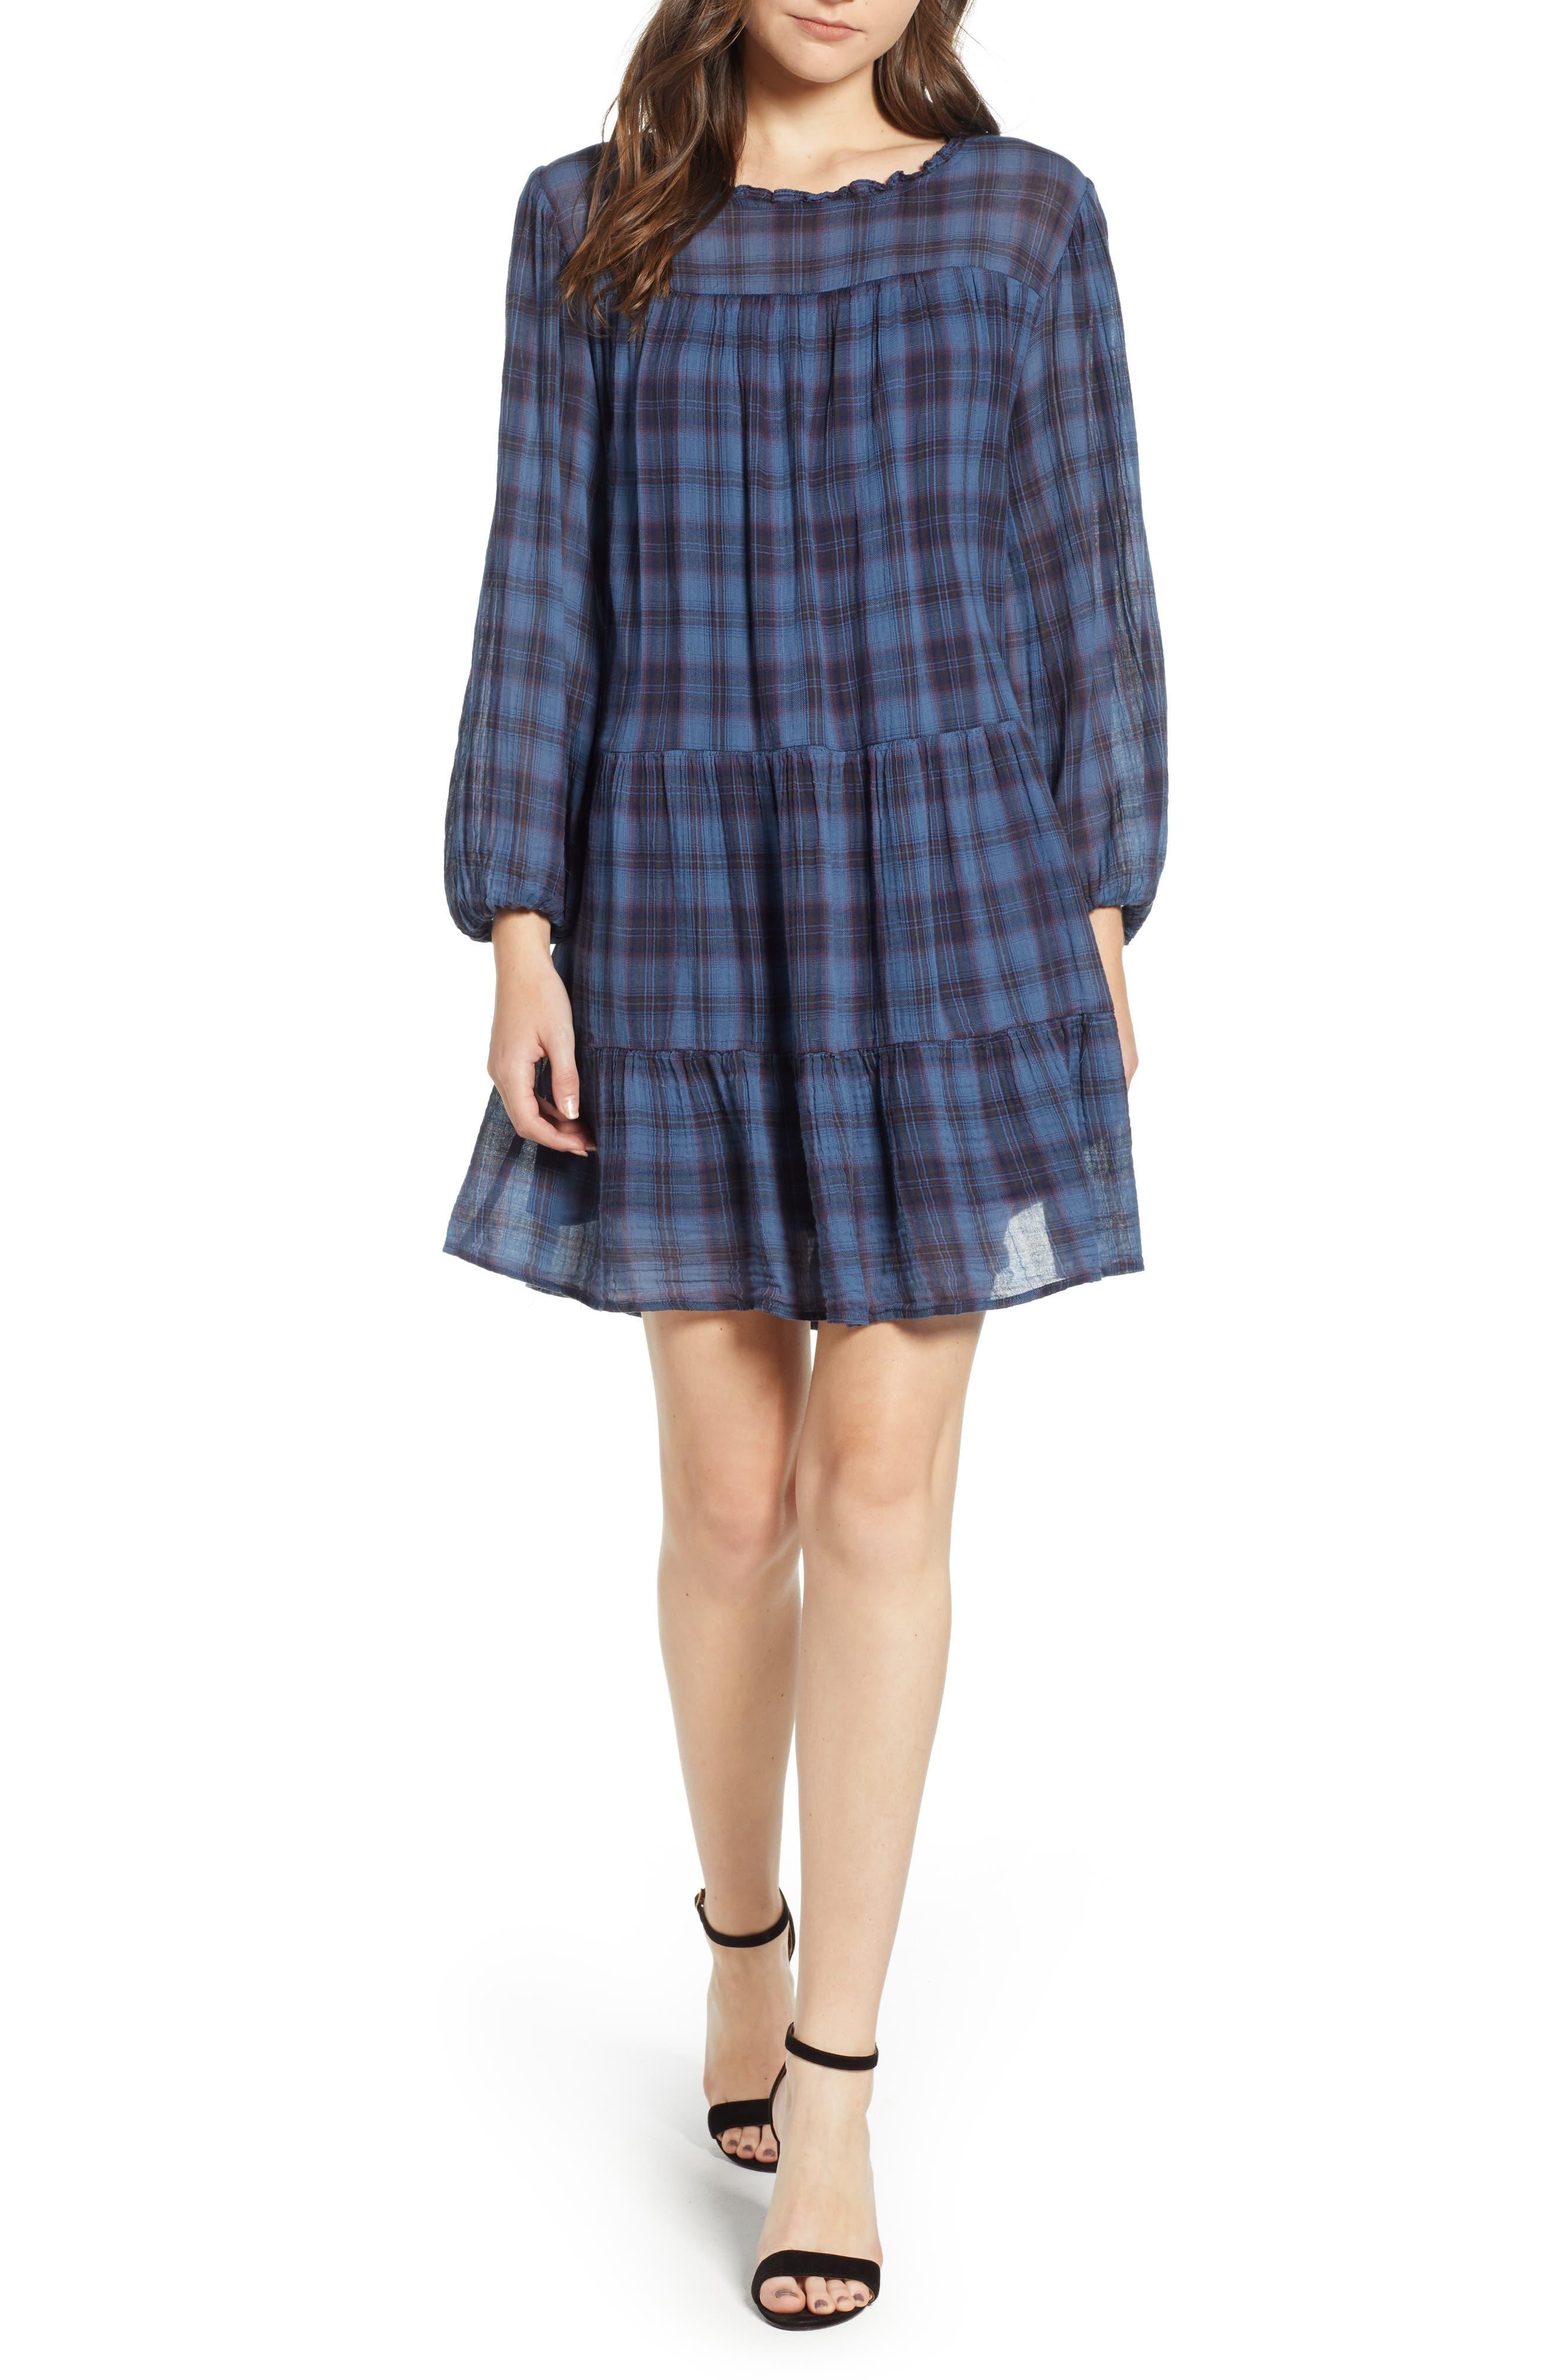 Soft Tiered Plaid Cotton Shift Dress,                             Main thumbnail 1, color,                             437